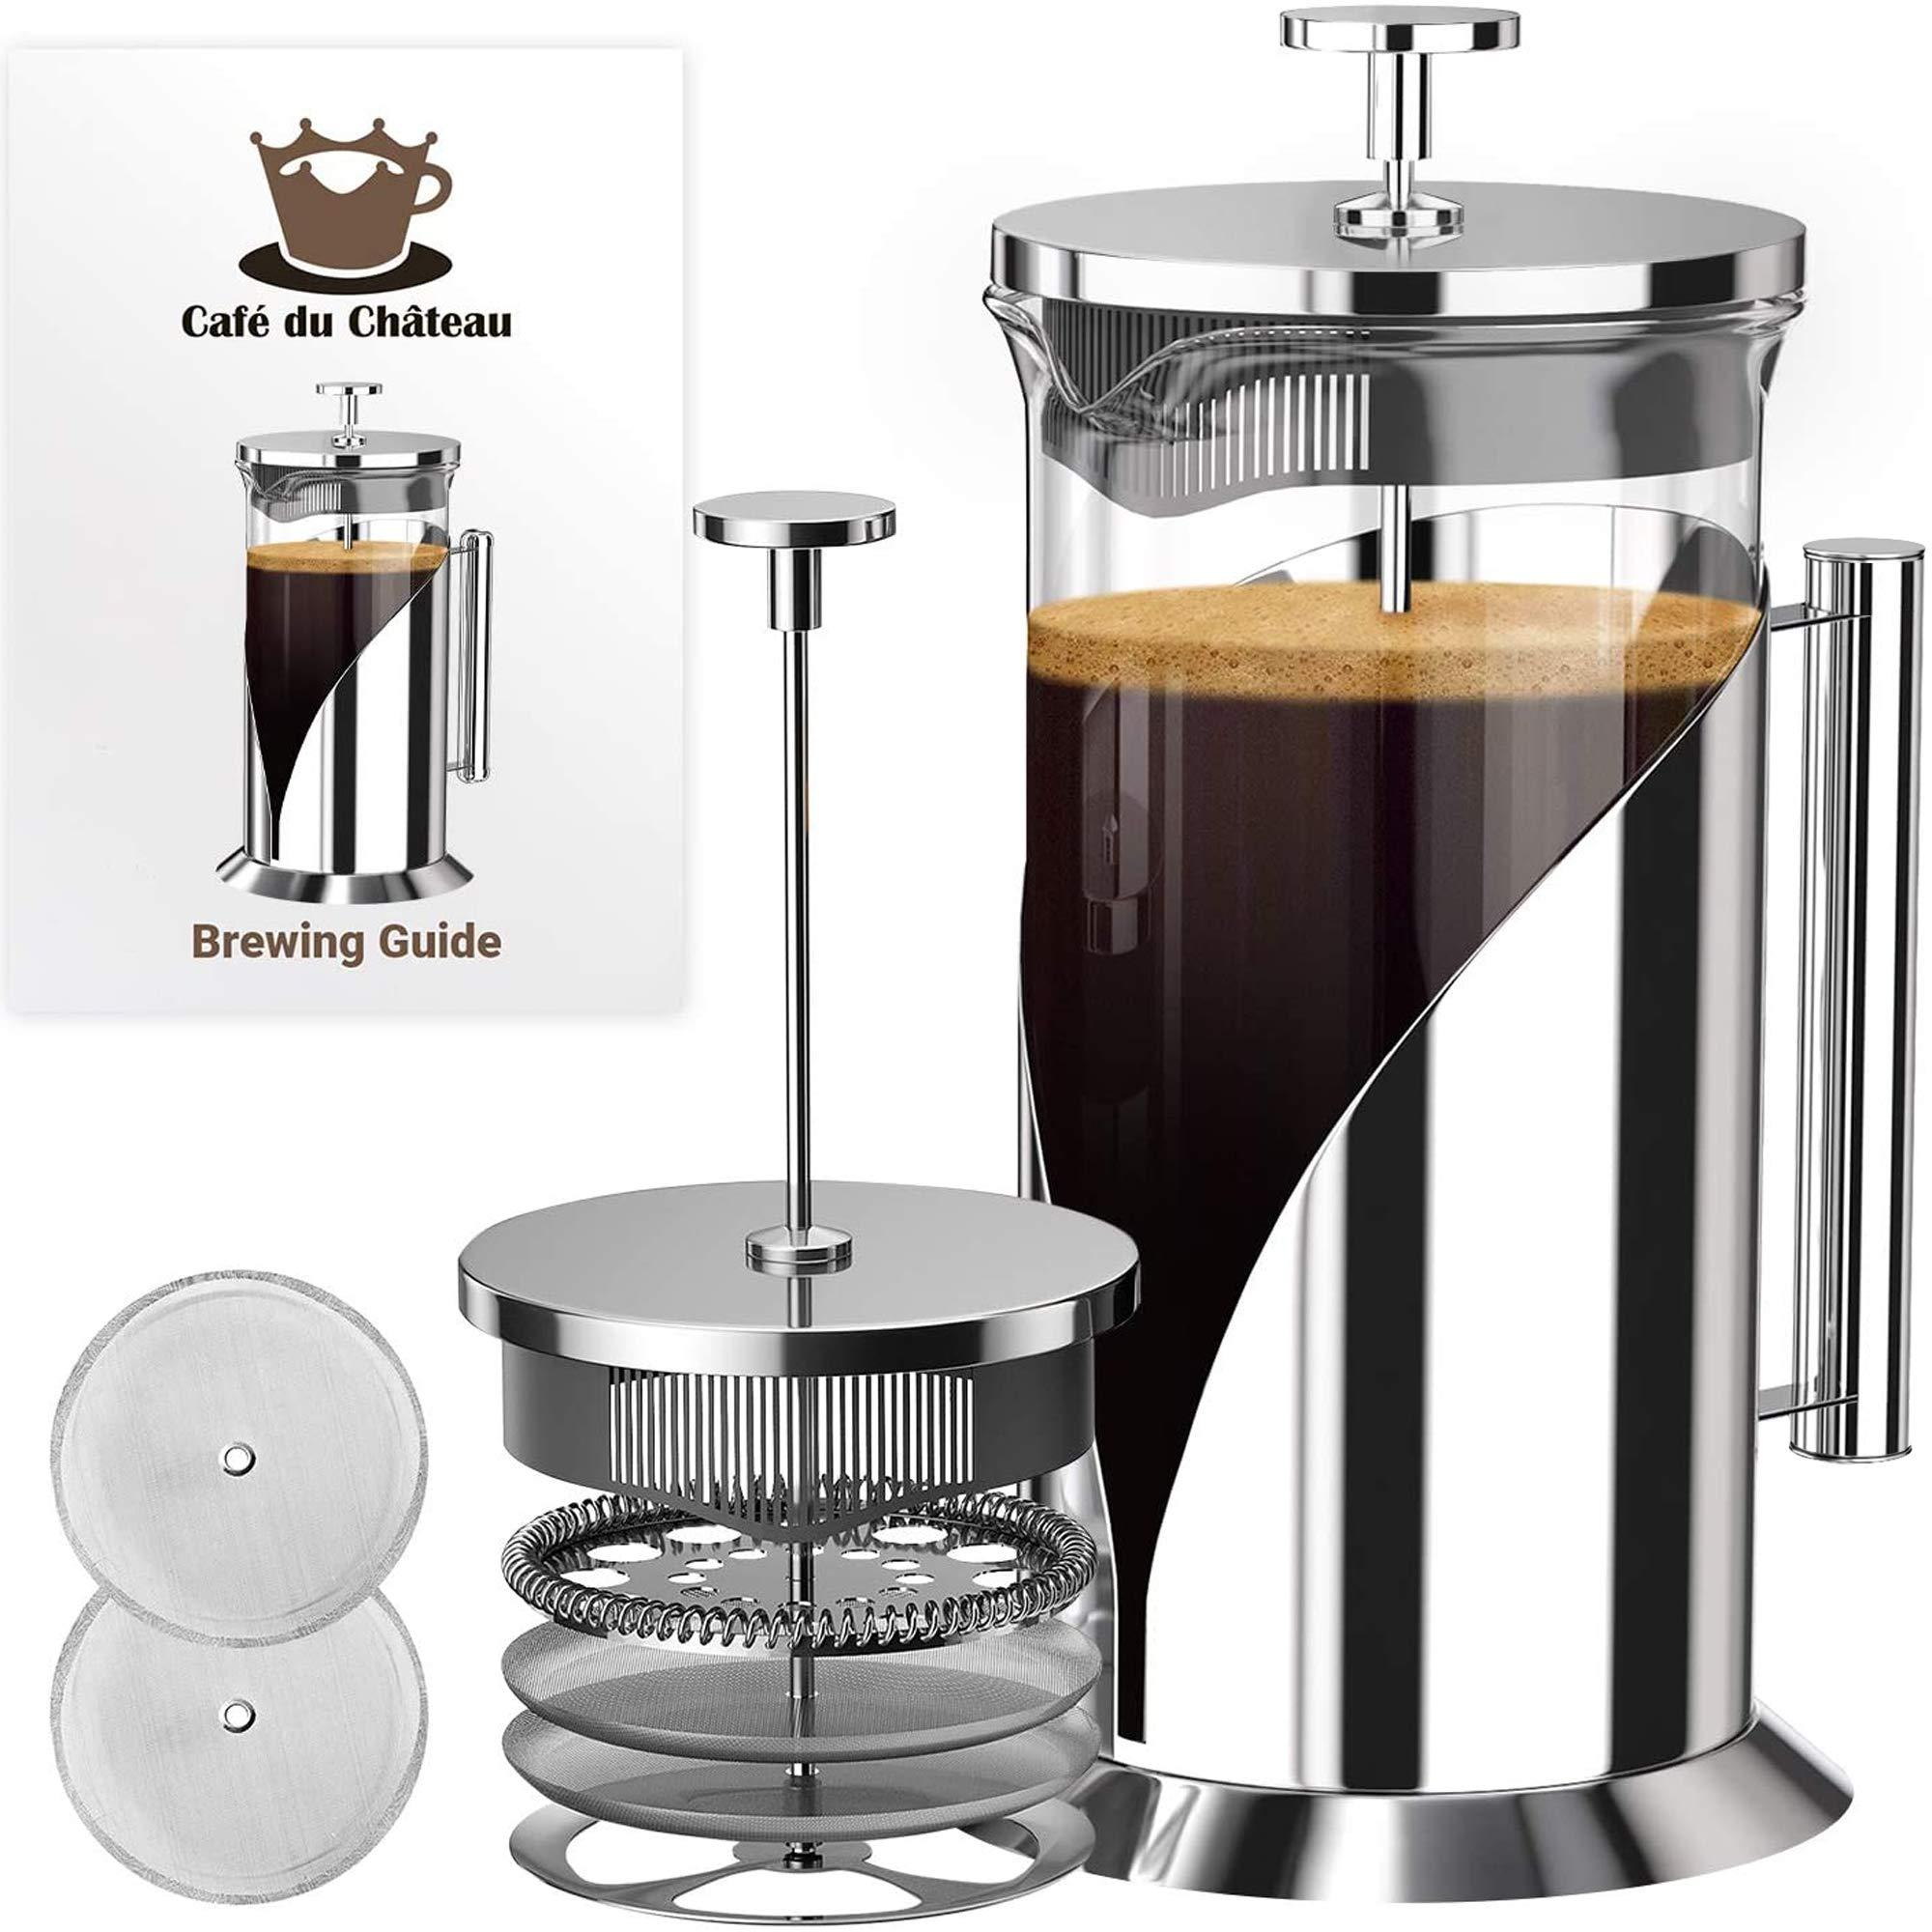 Mua Cafe Du Chateau French Press Coffee Maker (34 oz) - Stainless Steel Coffee Press with 4 Level Filter - Heat Resistant Carafe trên Amazon Mỹ chính hãng 2021 | Fado